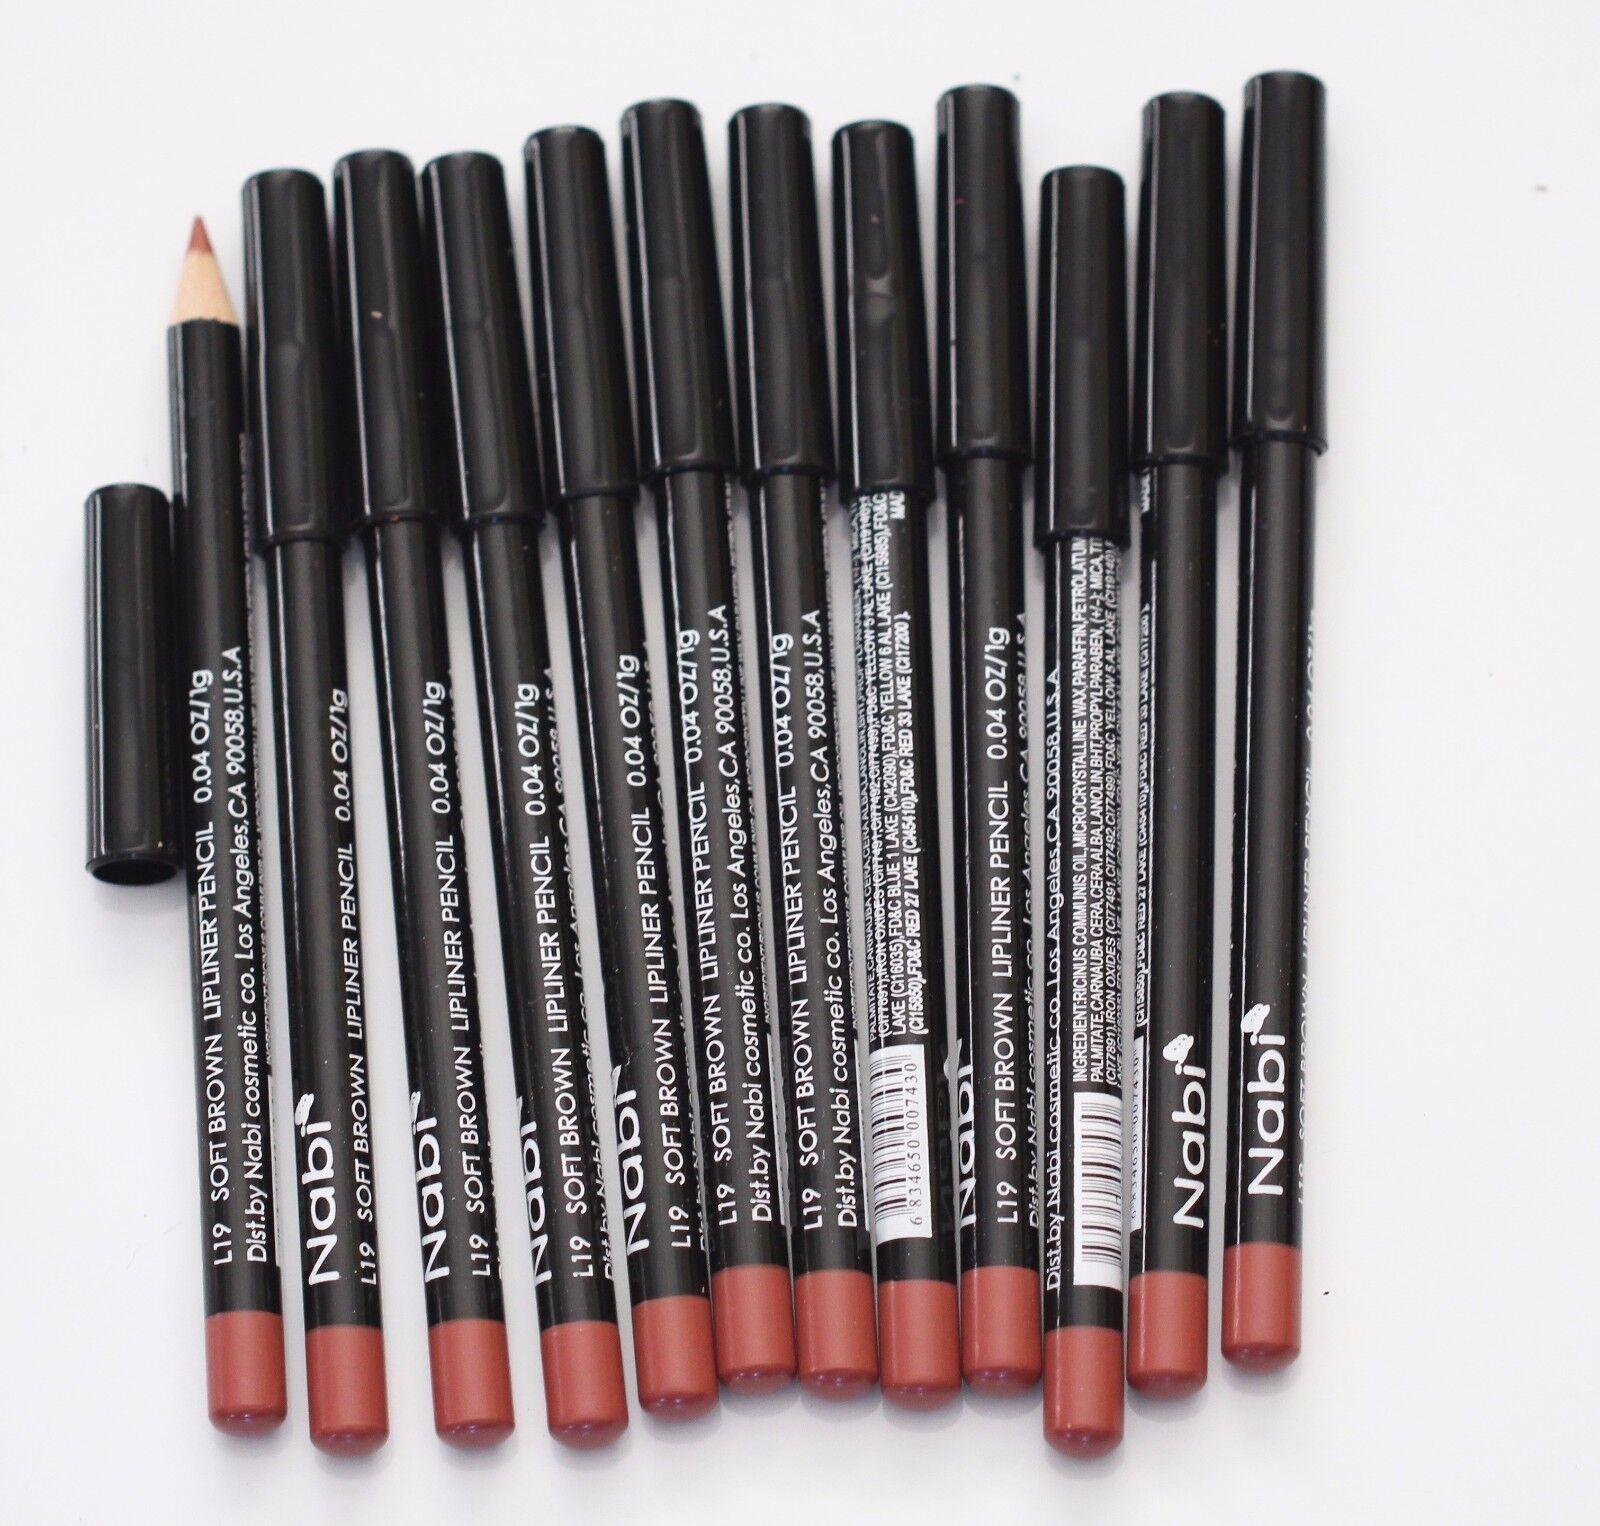 12 pcs NABI L19 SOFT BROWN Lip Liner Lipliner Pencil